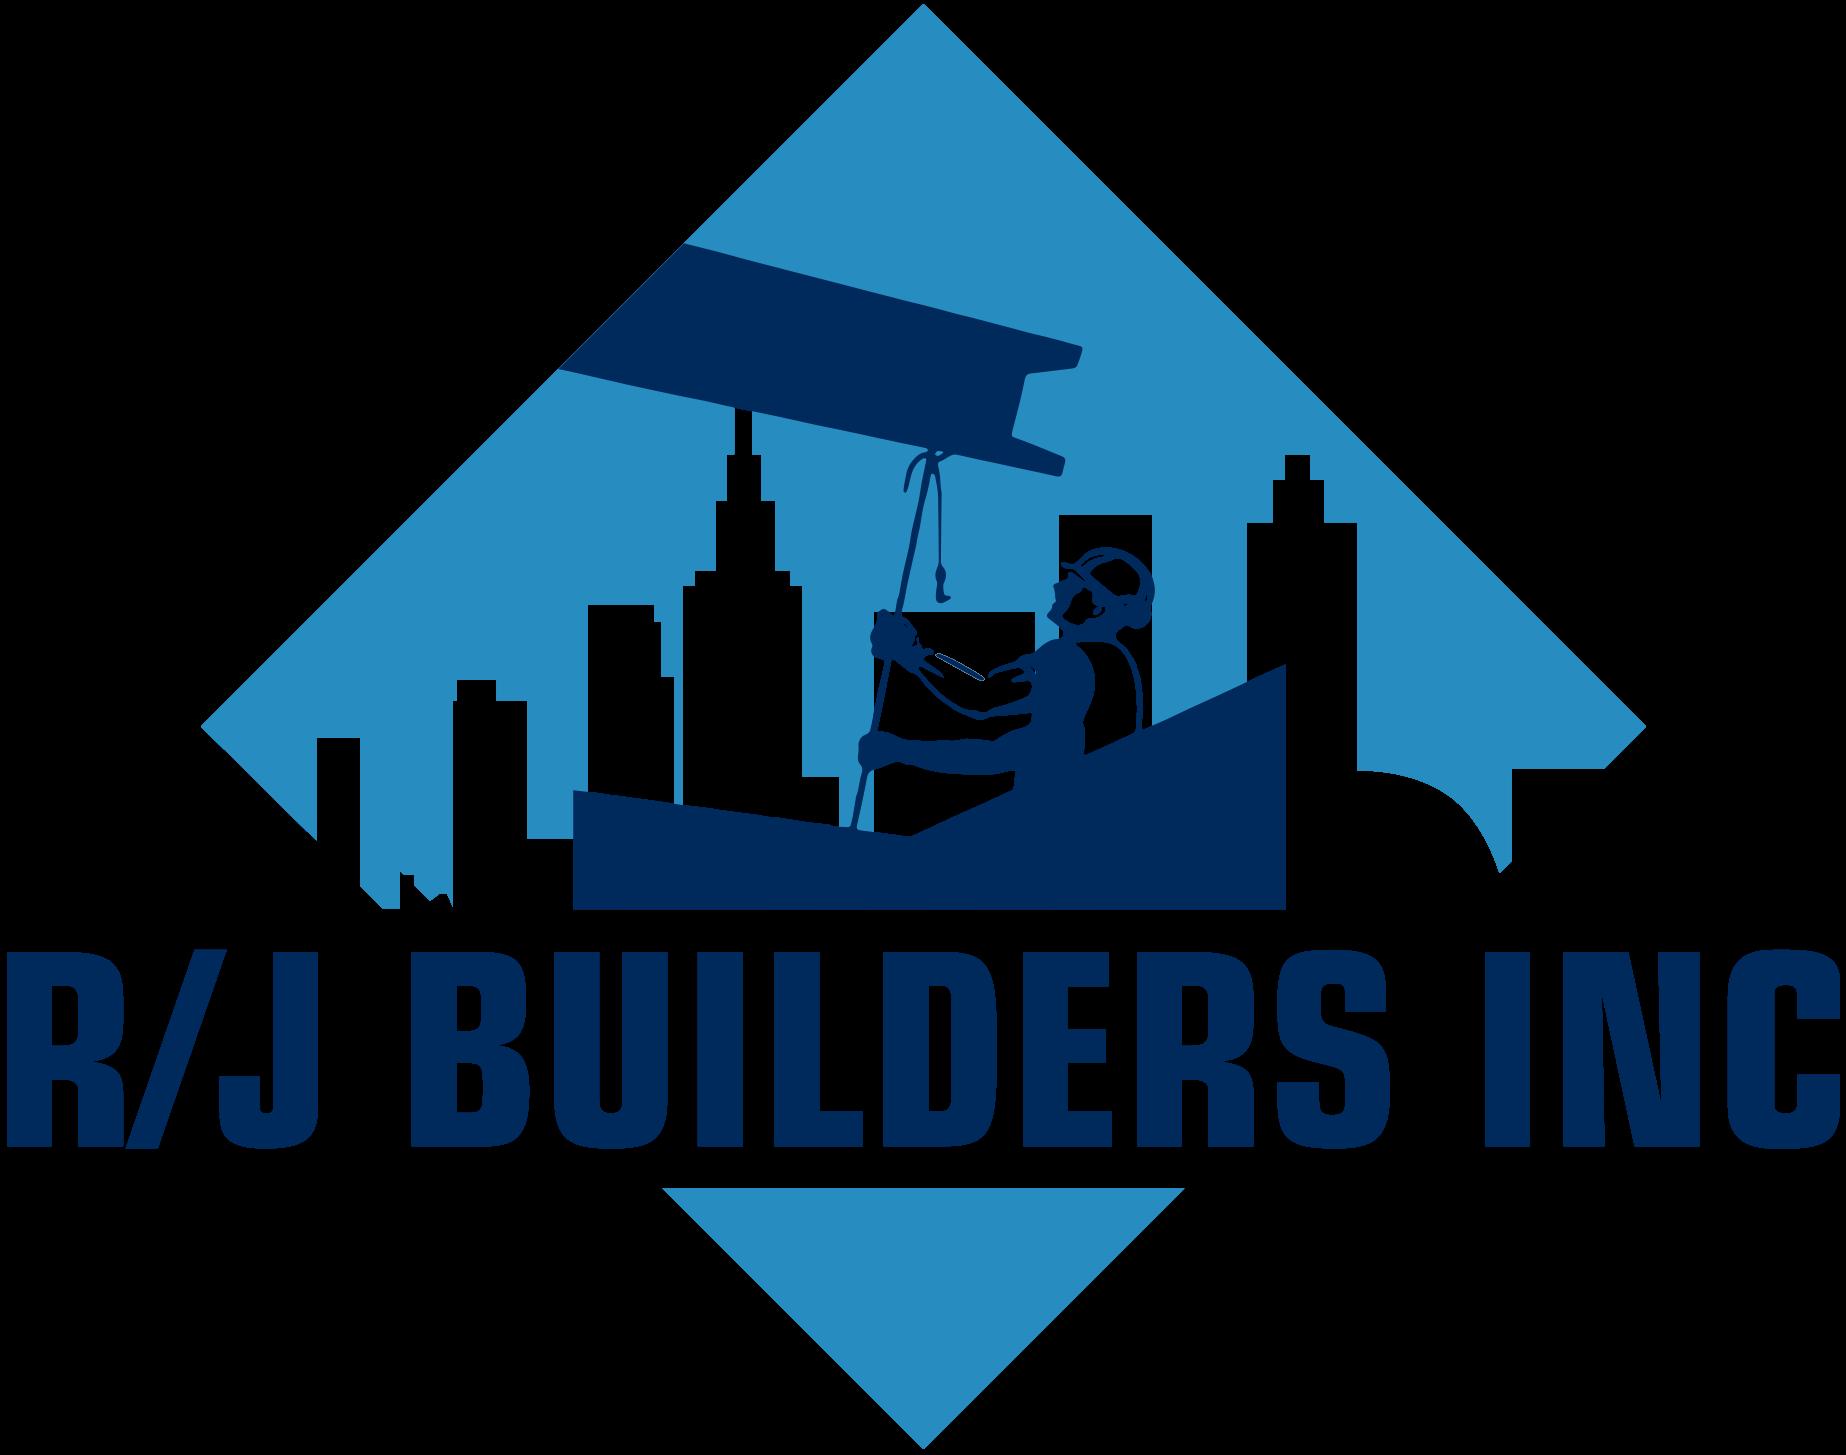 R/J Builders Inc Logo